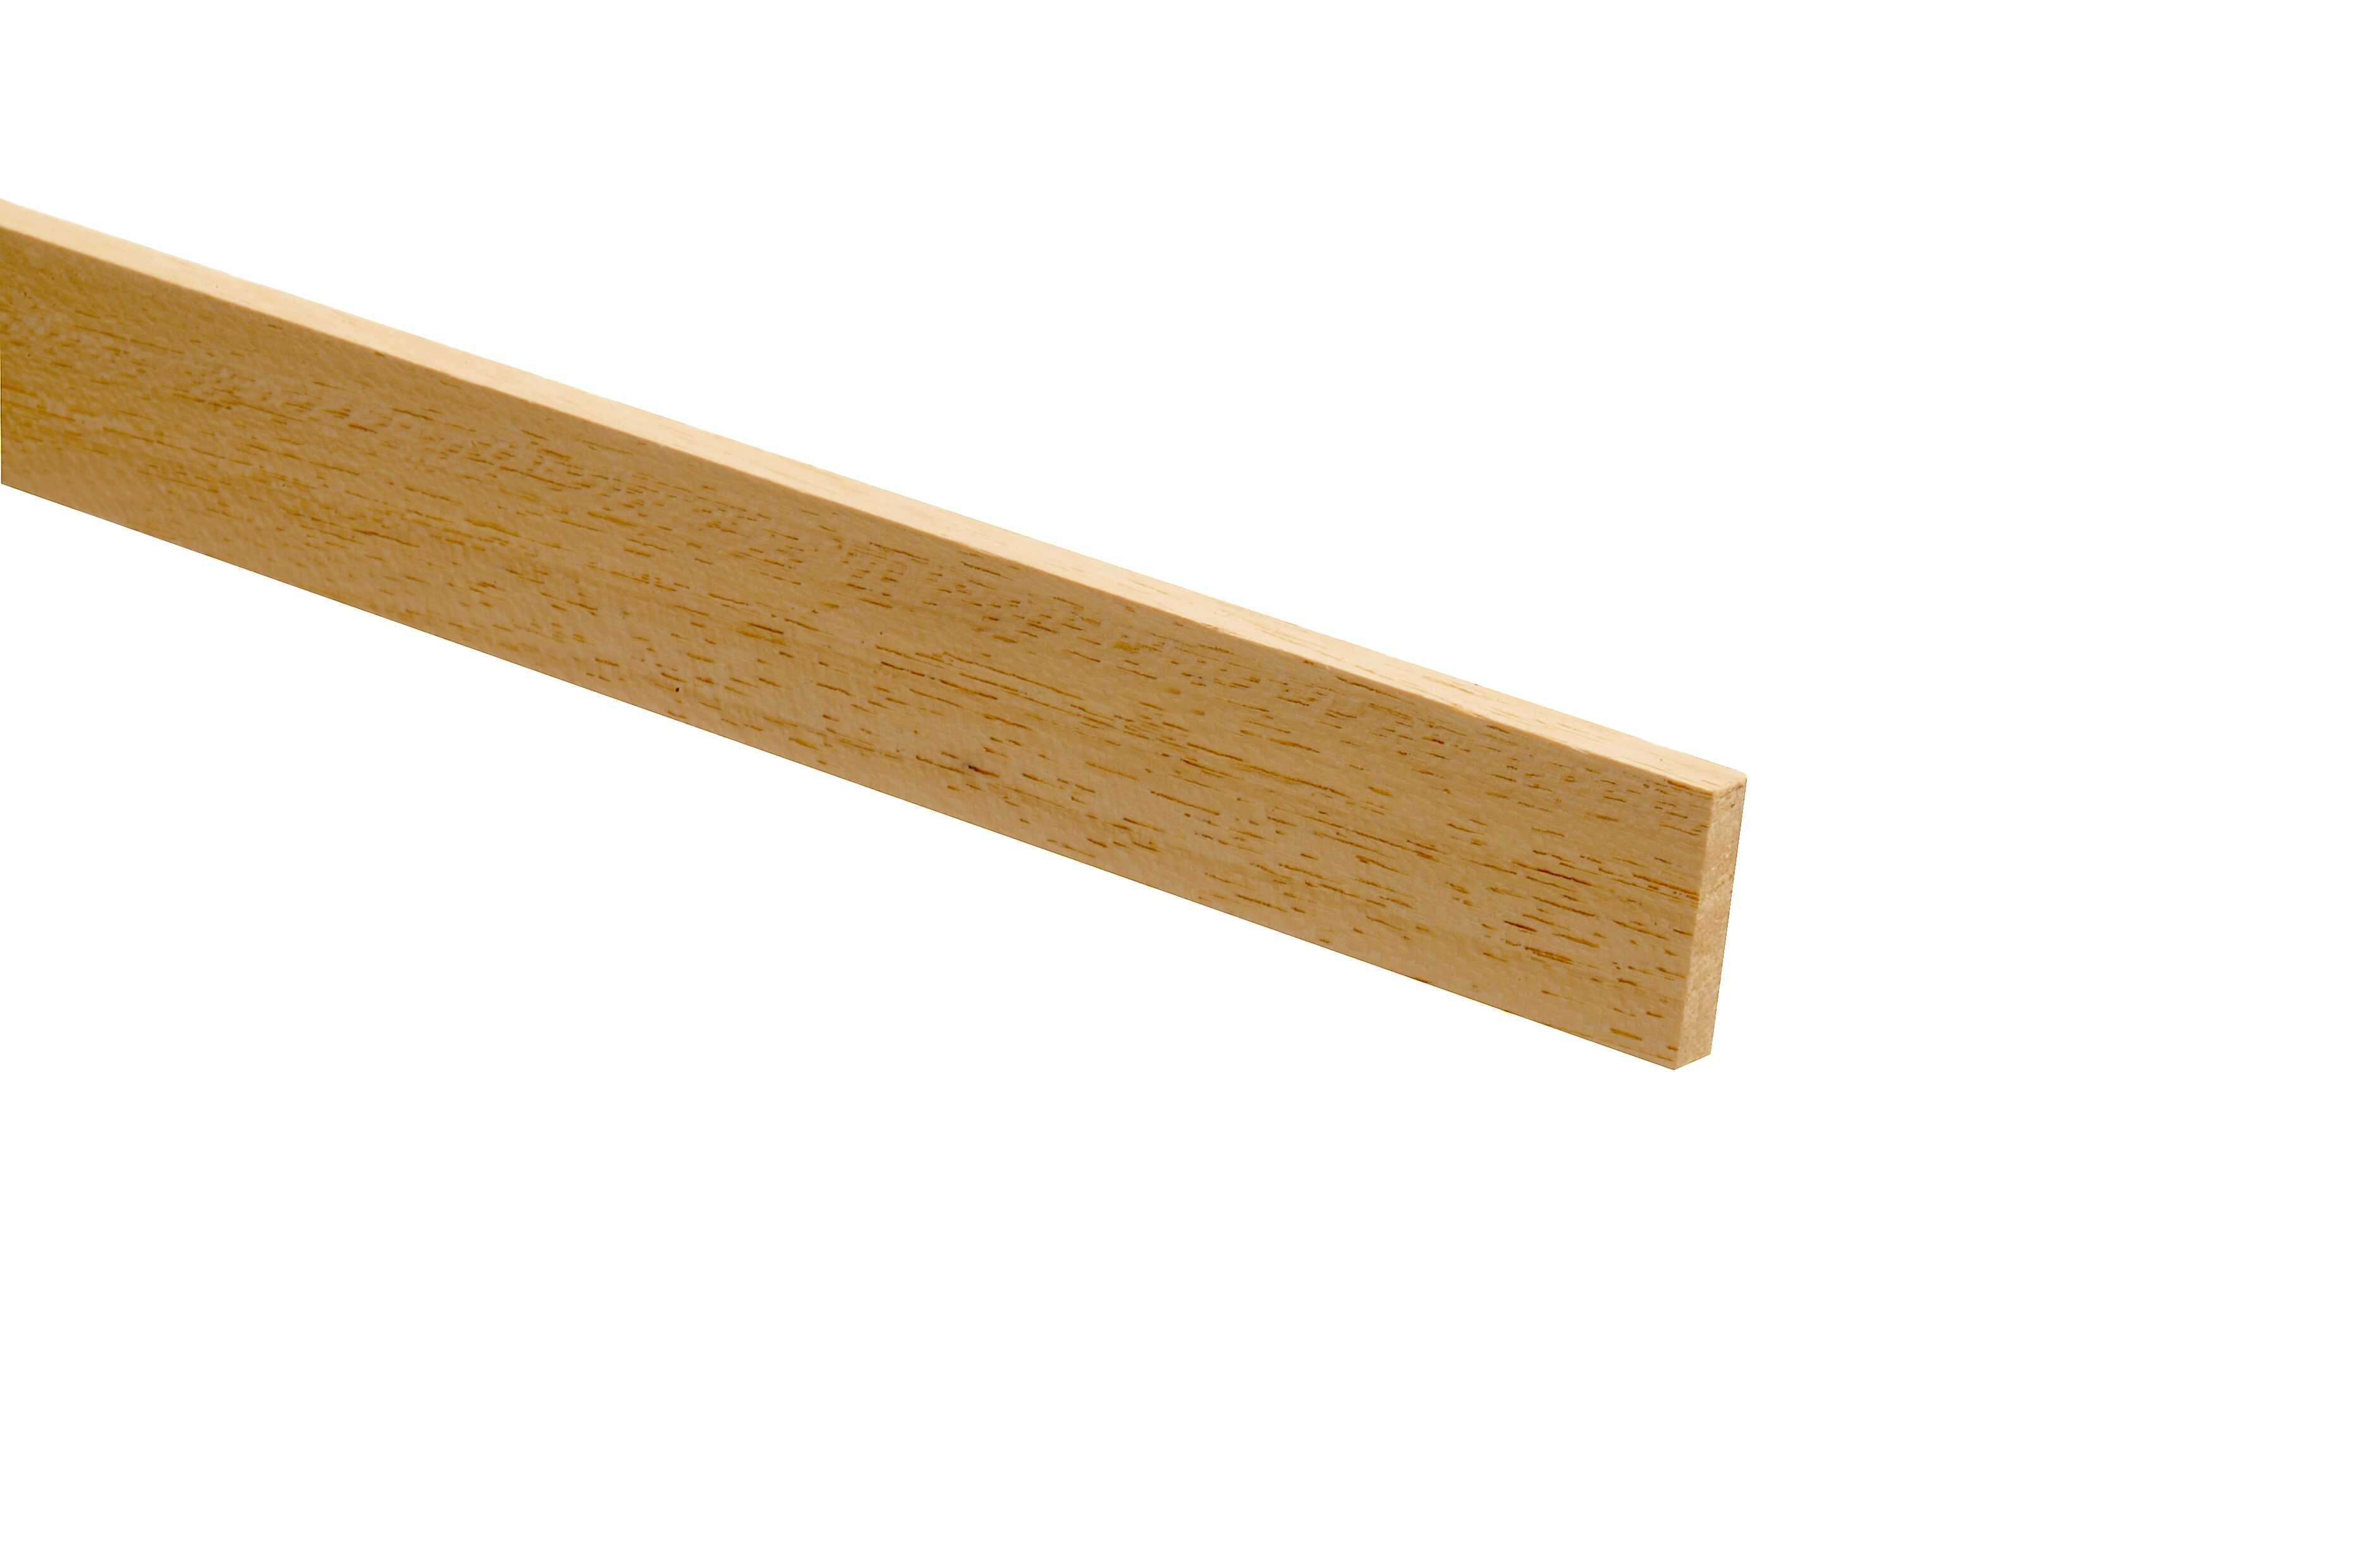 35 Light Hardwood PSE Stripwood 6 x 6 x 2400mm